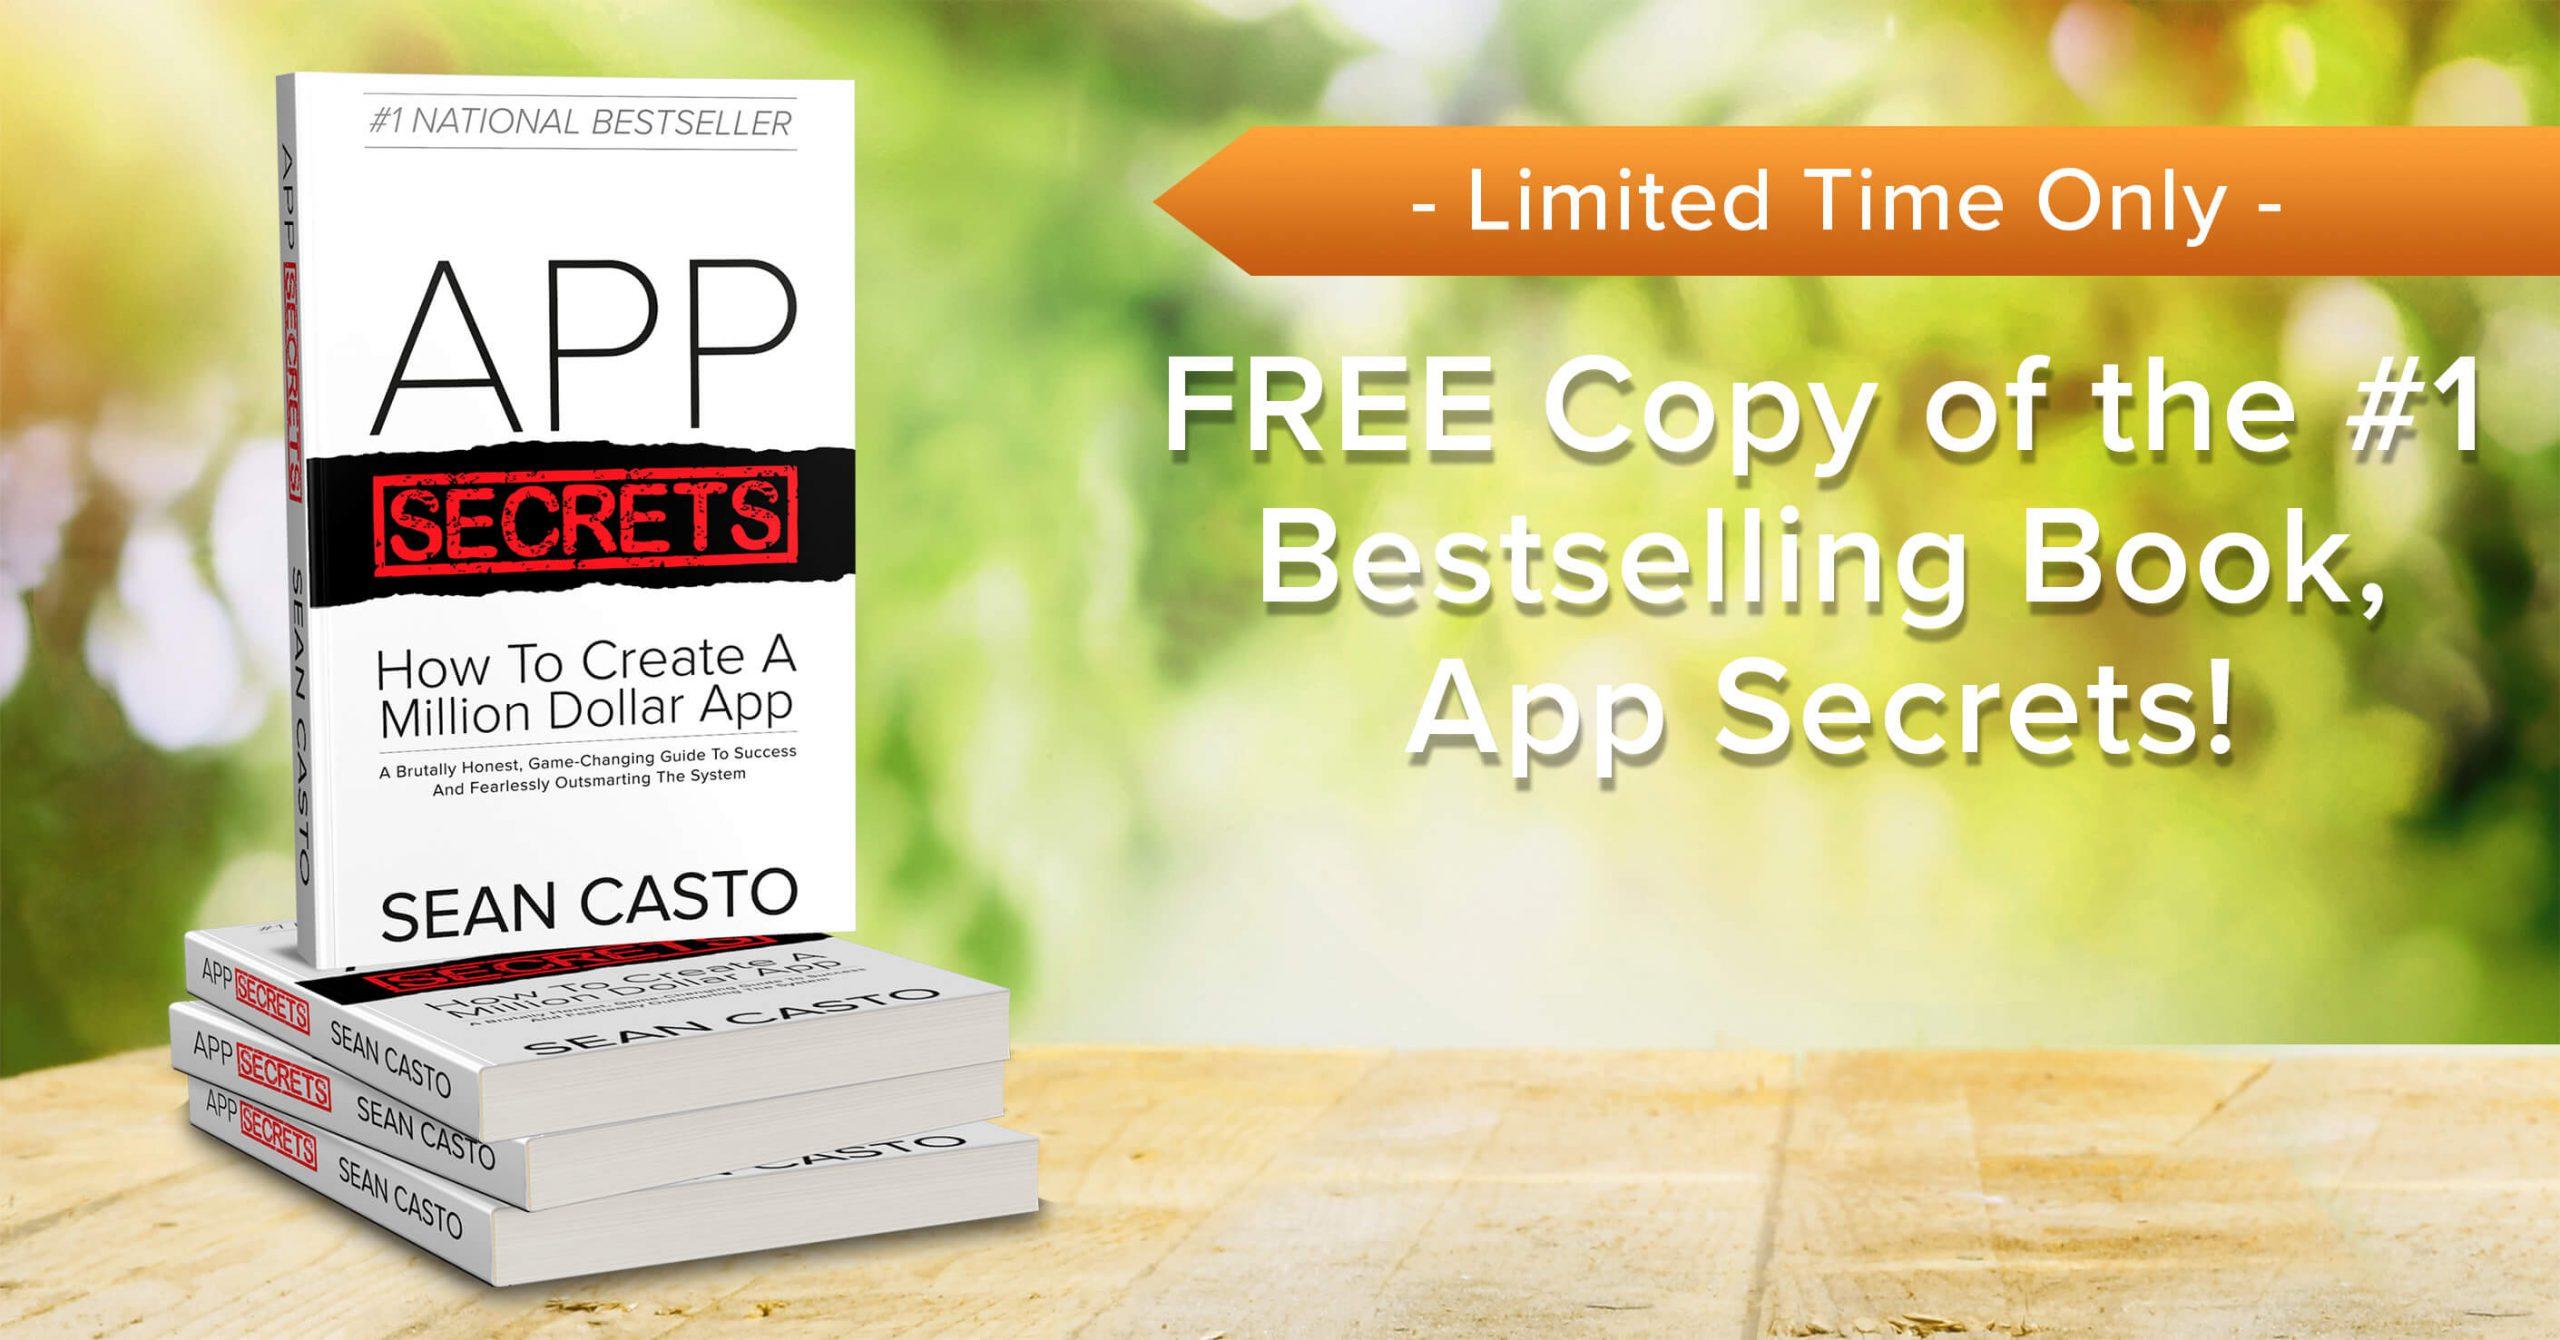 Free App Secrets Book - How To Create A Million Dollar App